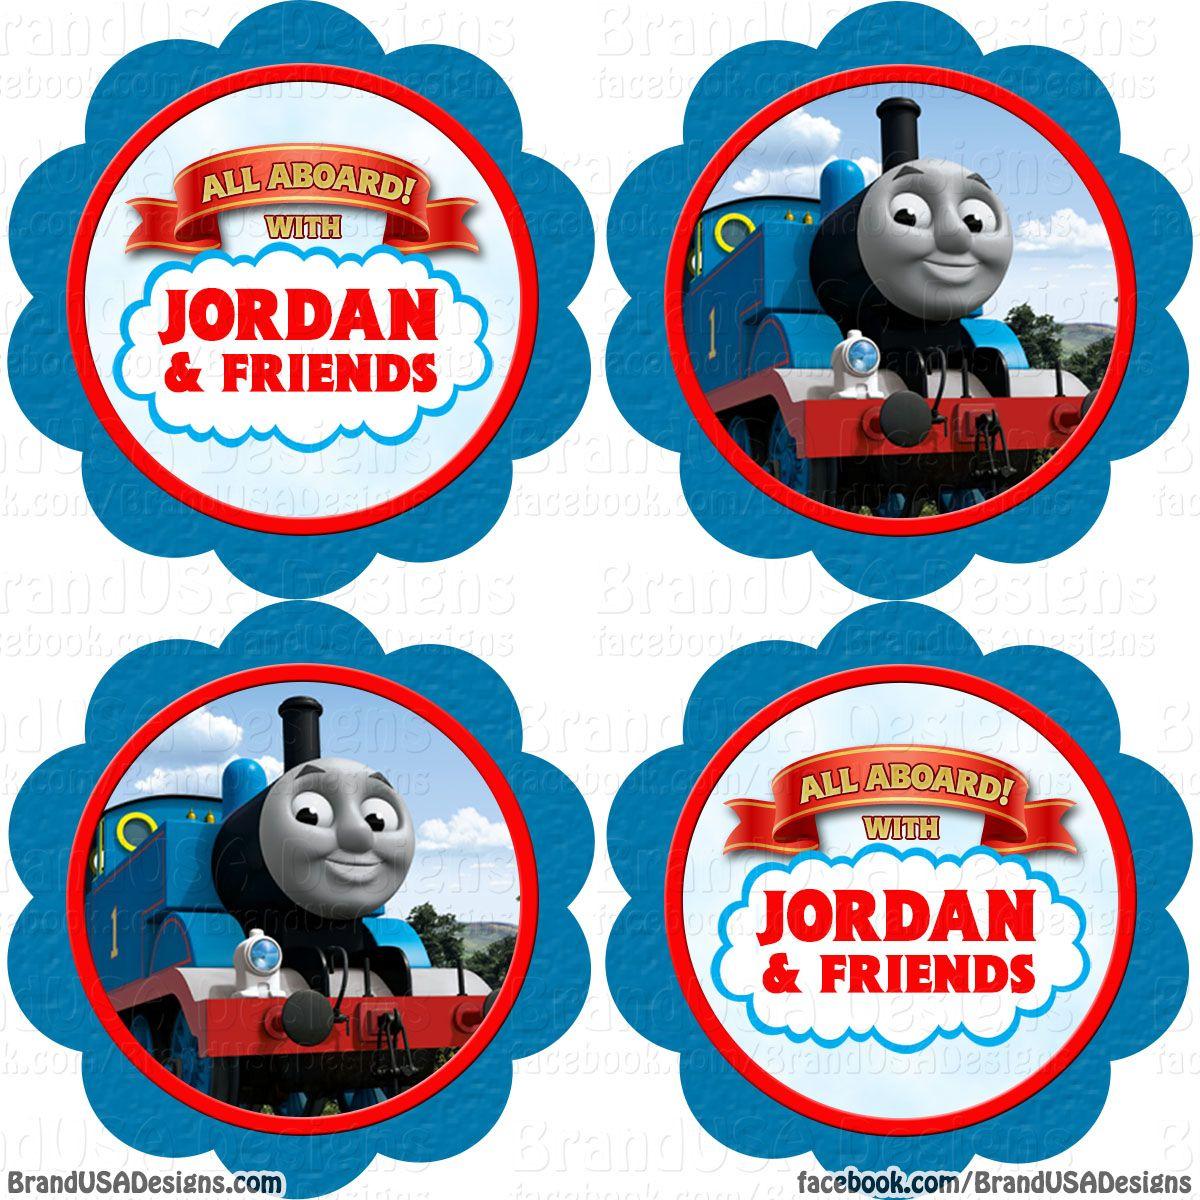 Free Printable Thomas The Train Cup Cake Toppers - Google Search - Free Printable Train Cupcake Toppers